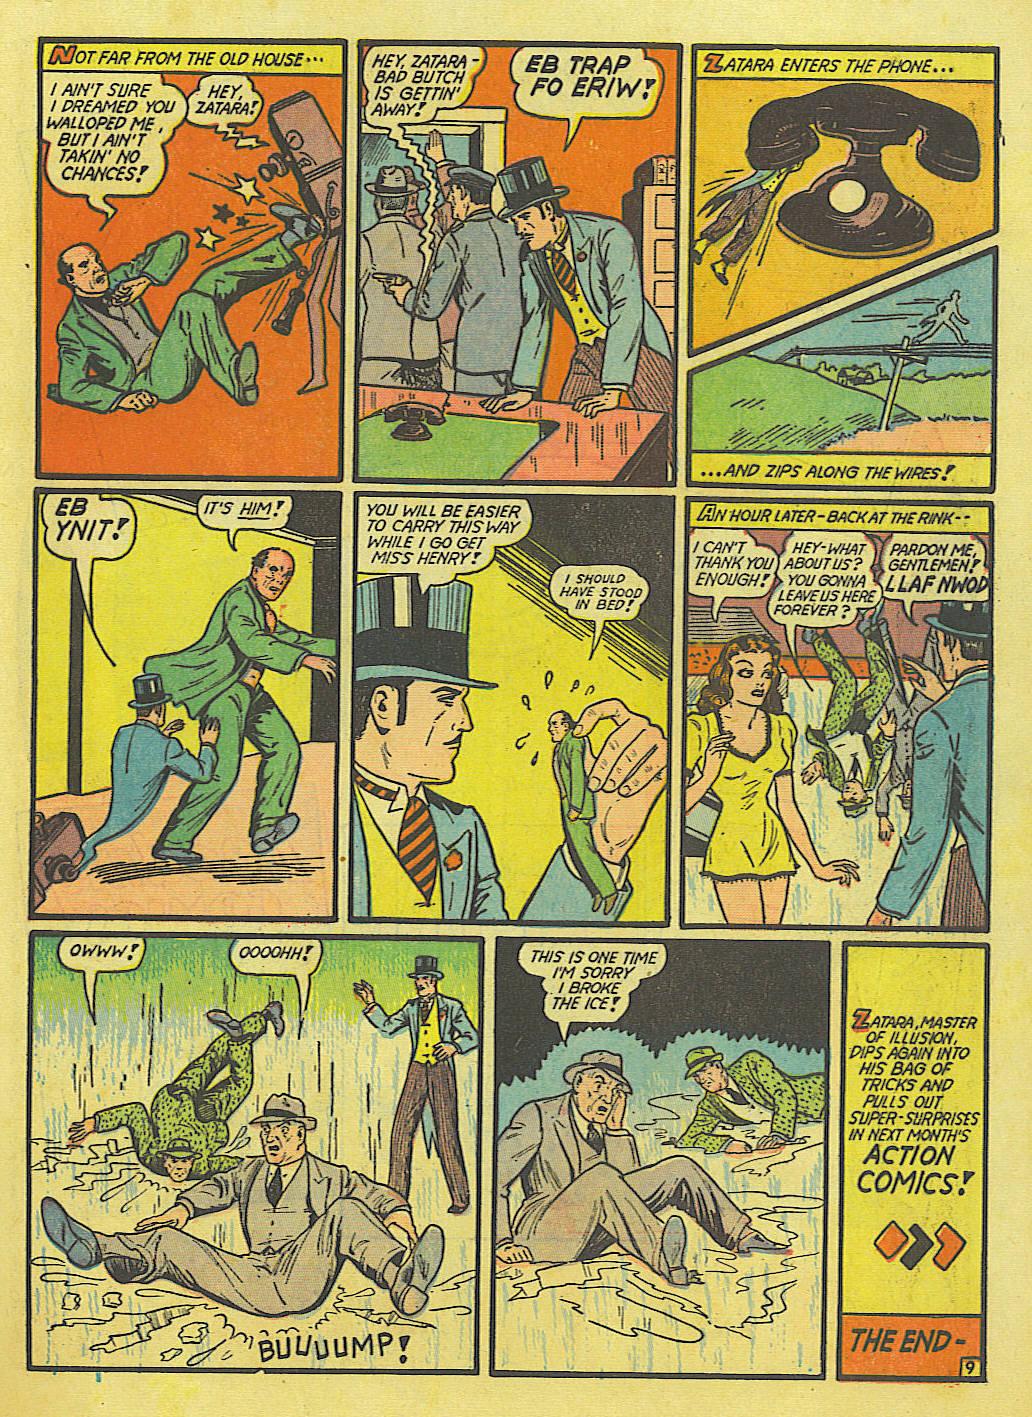 Action Comics (1938) 52 Page 64